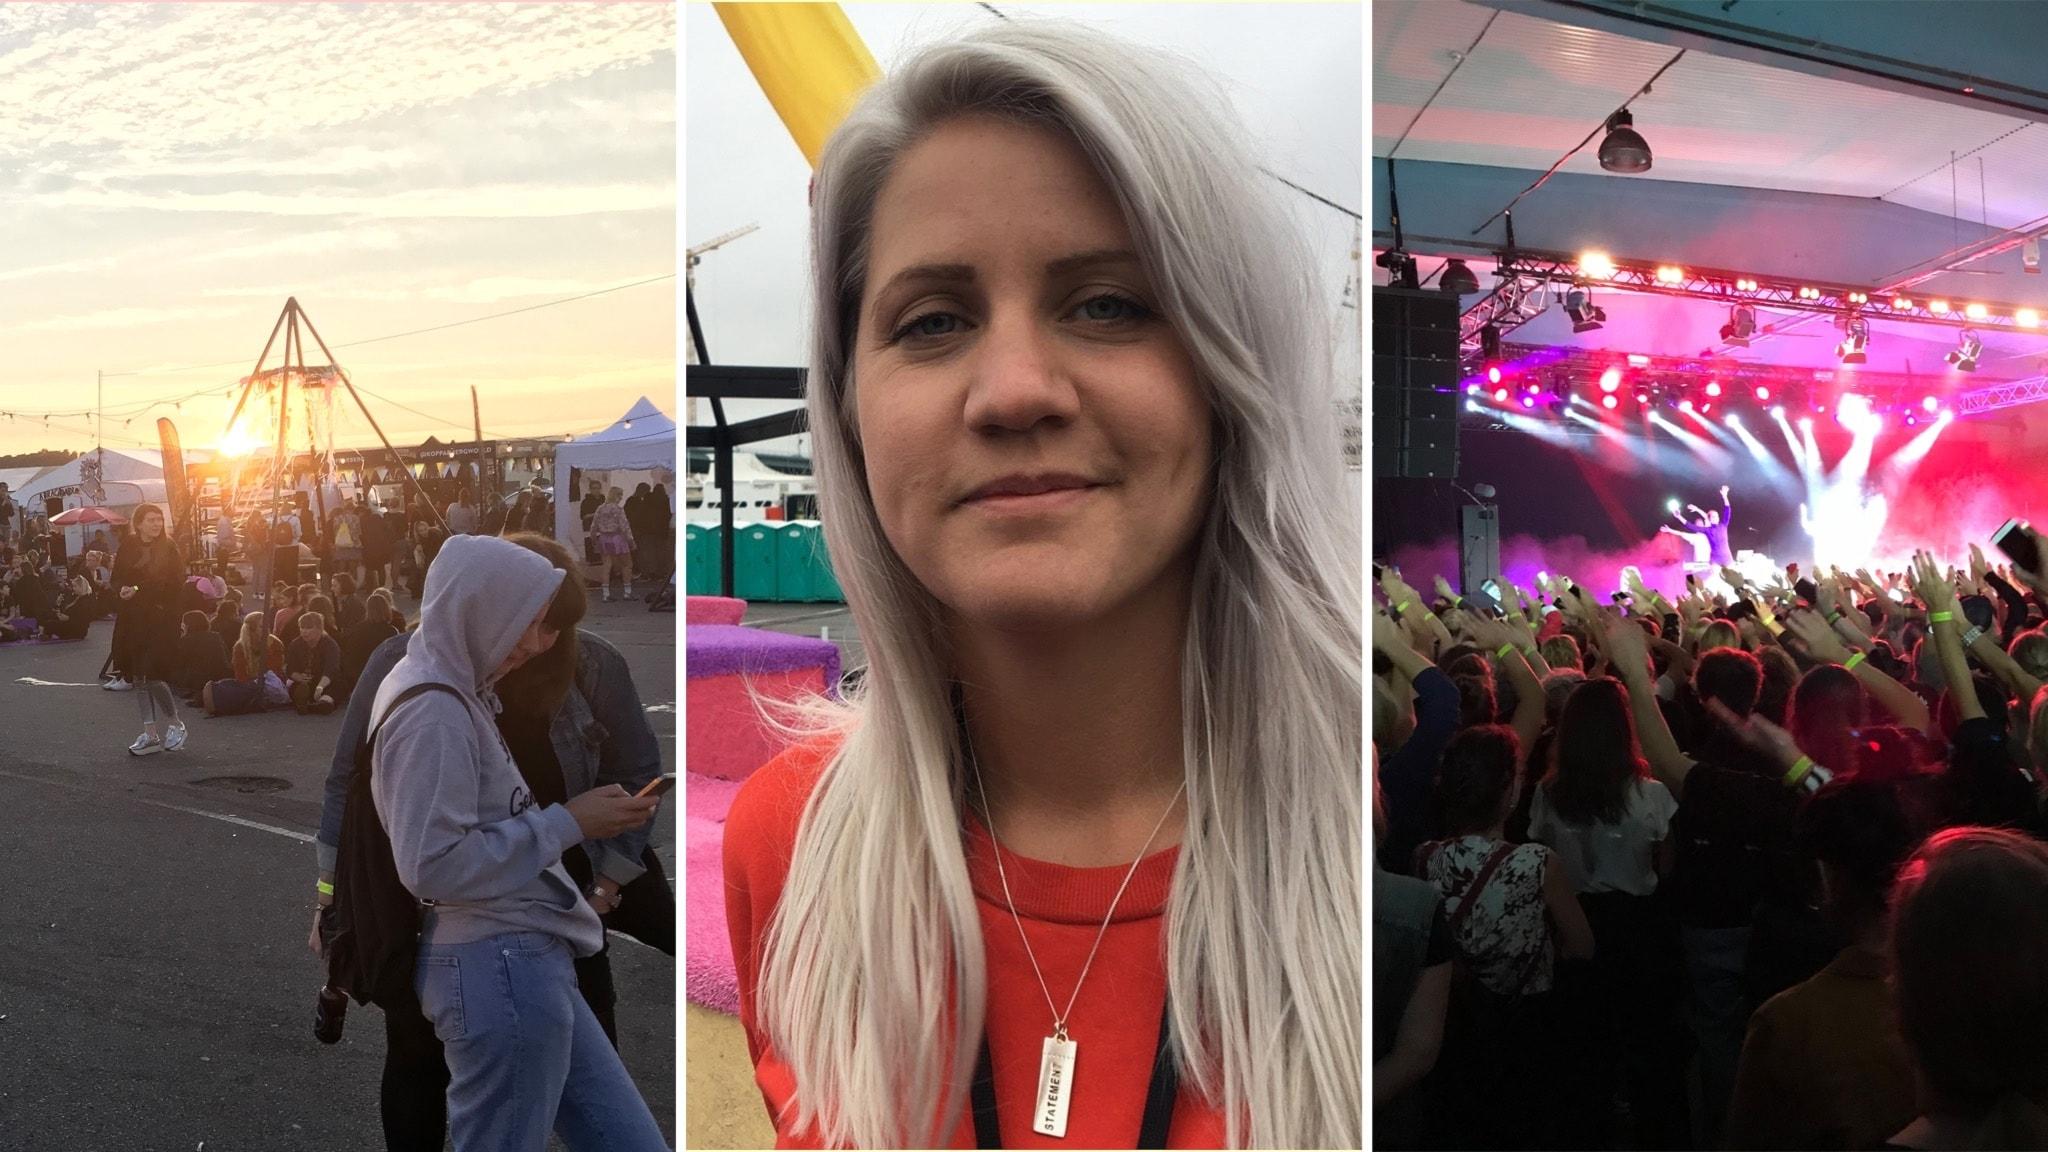 Mansfria Statementfestivalen blir klubbturné och Wera von Essen tilldelades Borås Tidnings debutantpris